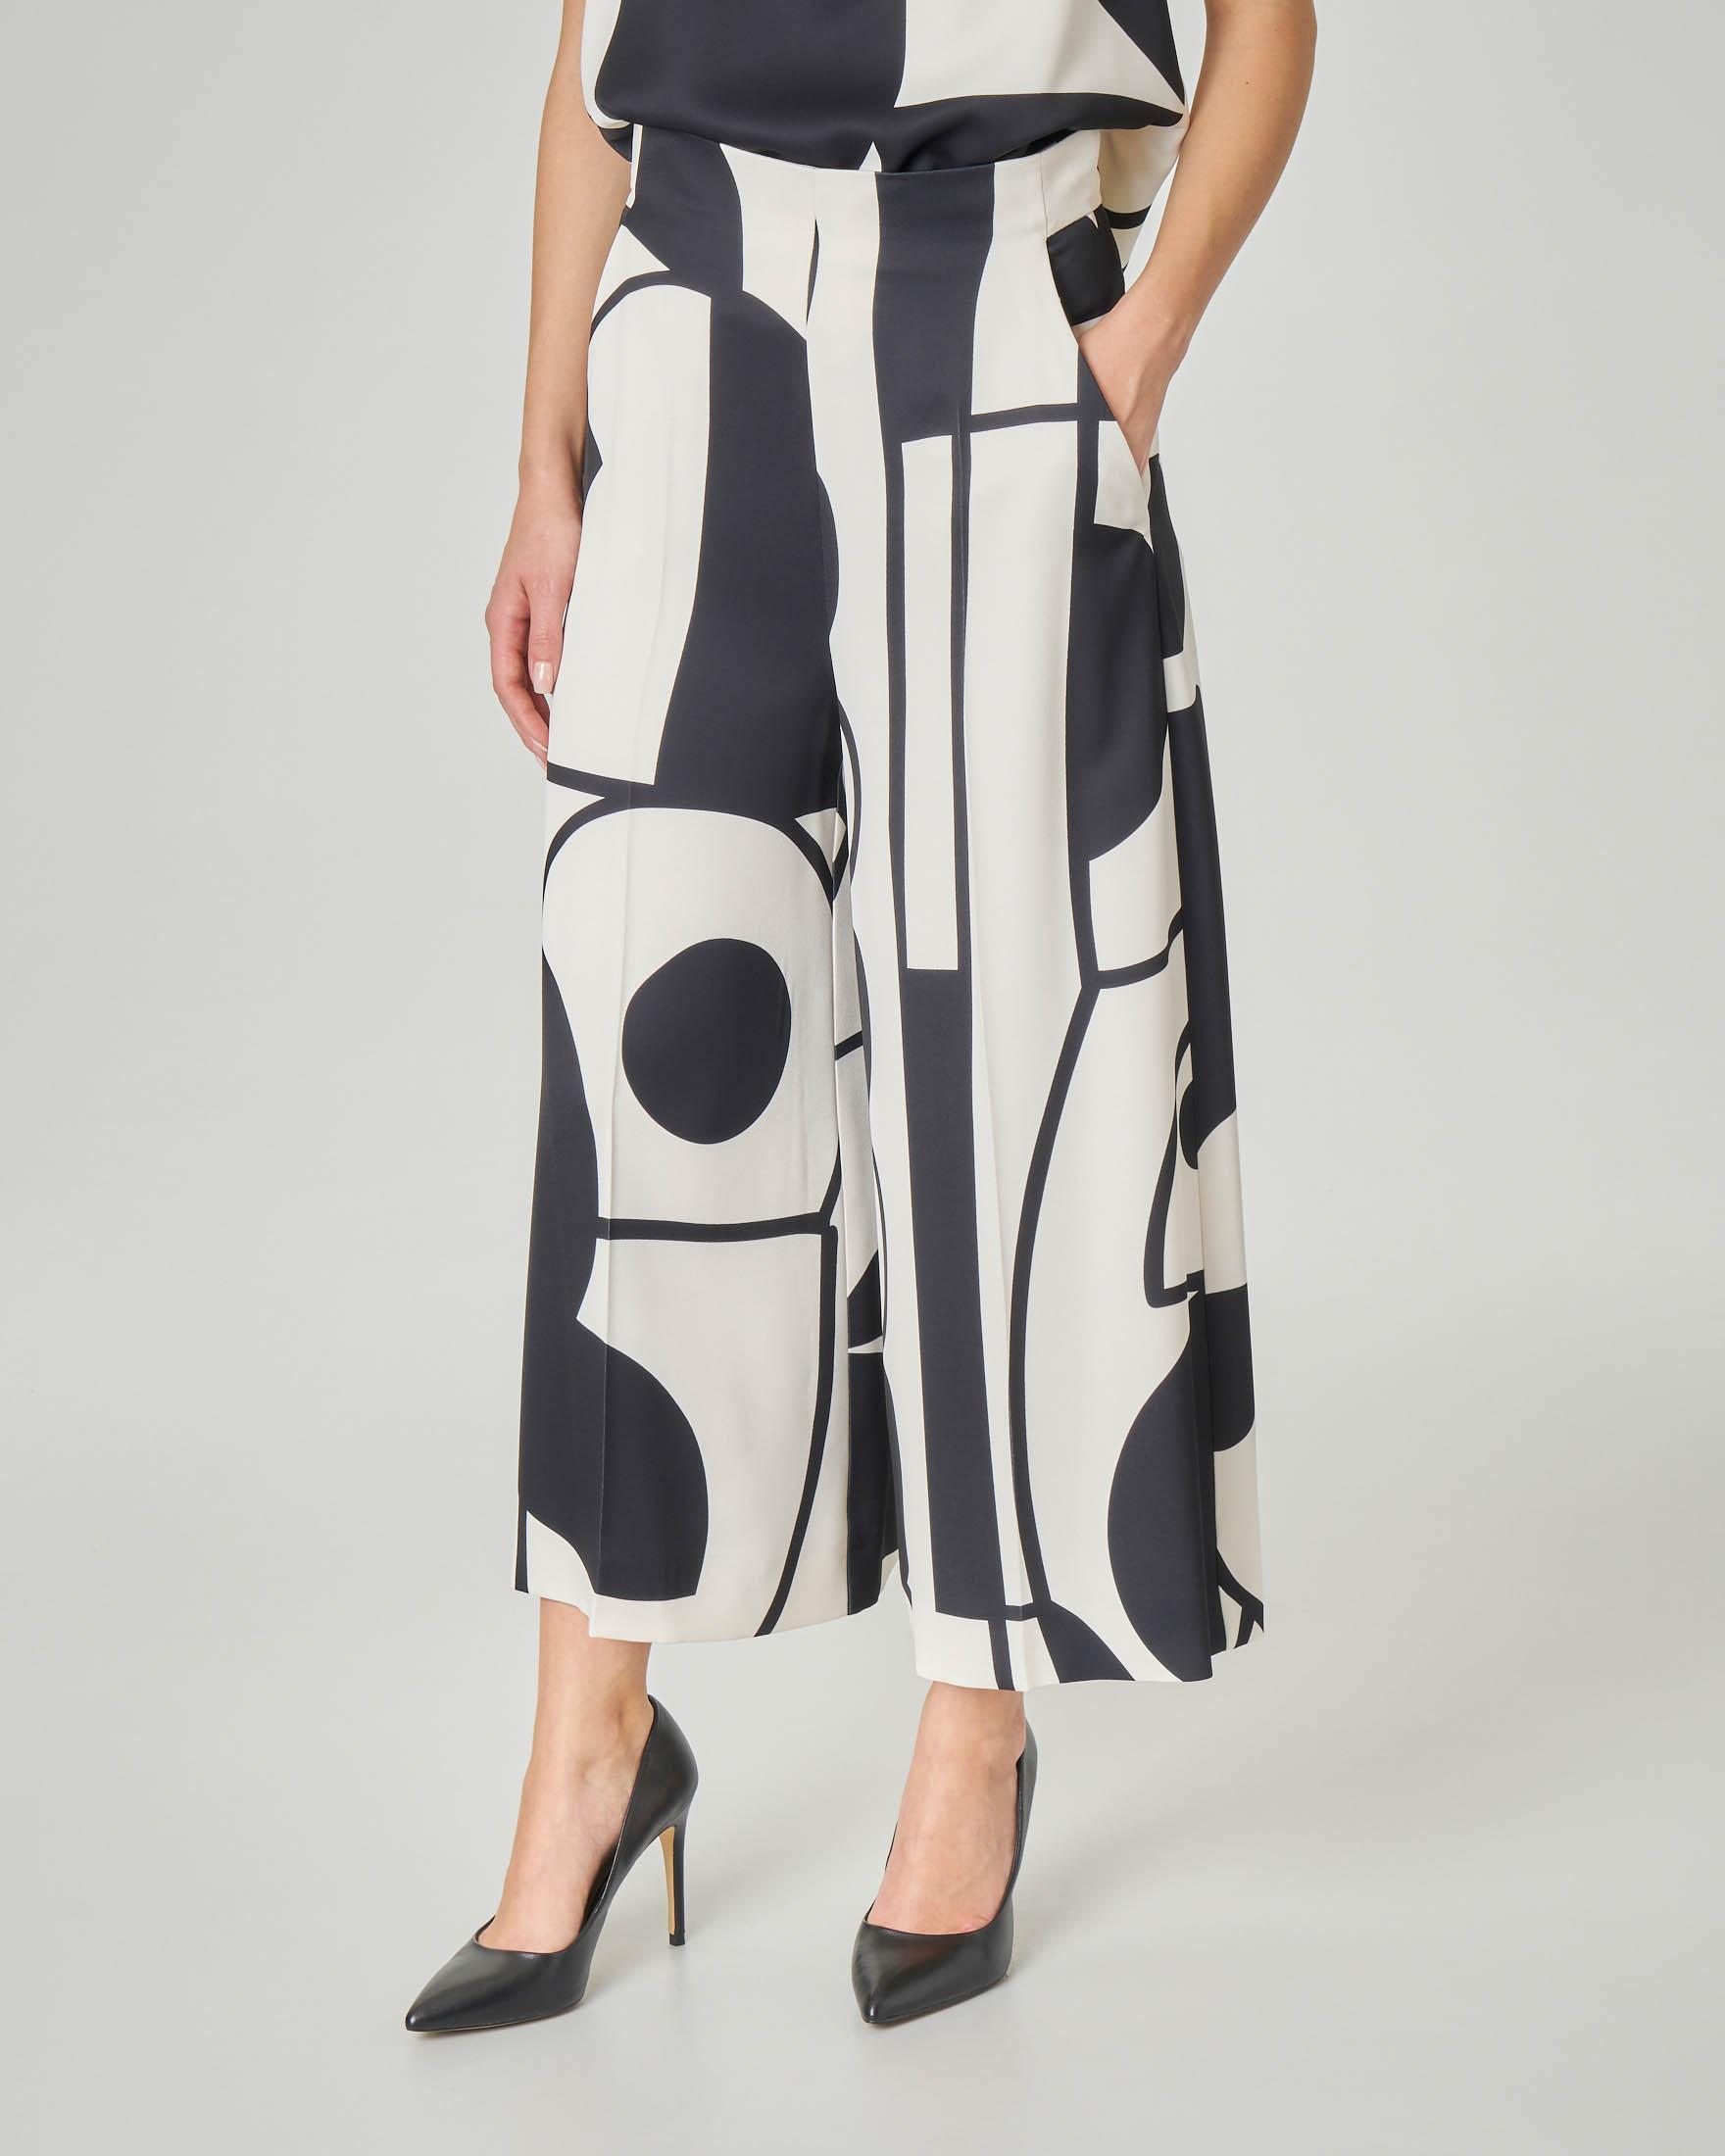 Pantaloni culotte LW x ART. 365 in crêpe a fantasia grafica in bianco e nero